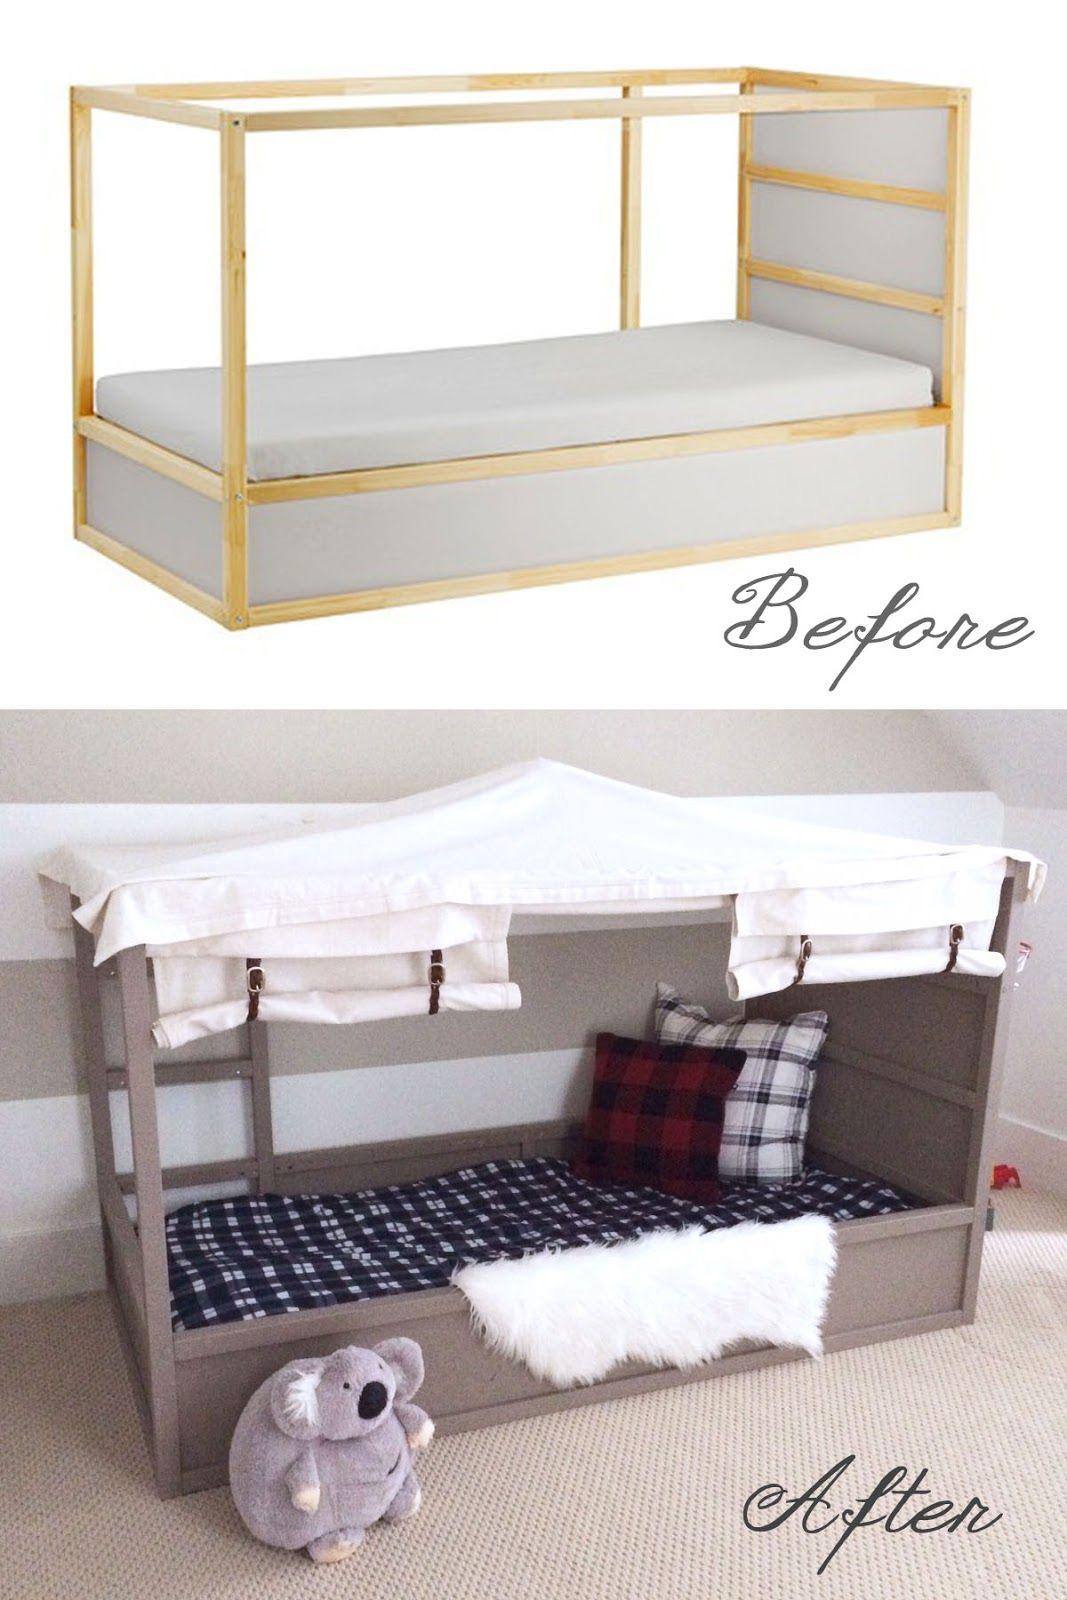 Harlow Thistle Home Design Lifestyle Diy Ikea Kura Bed